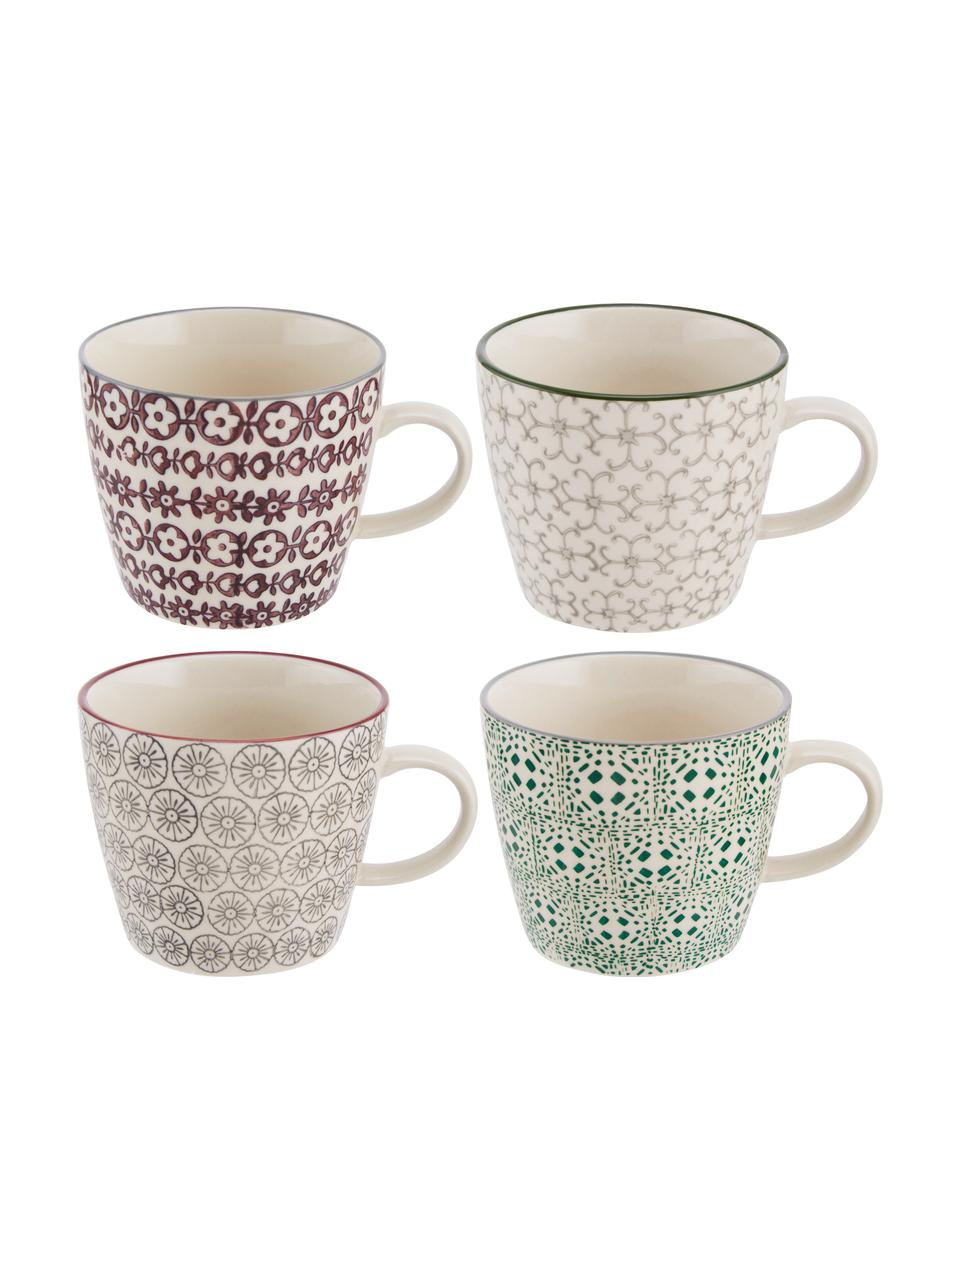 Set 4 tazze con motivo piccolo Karine, Gres, Bianco, verde, rosso, grigio, Ø 10 x Alt. 8 cm